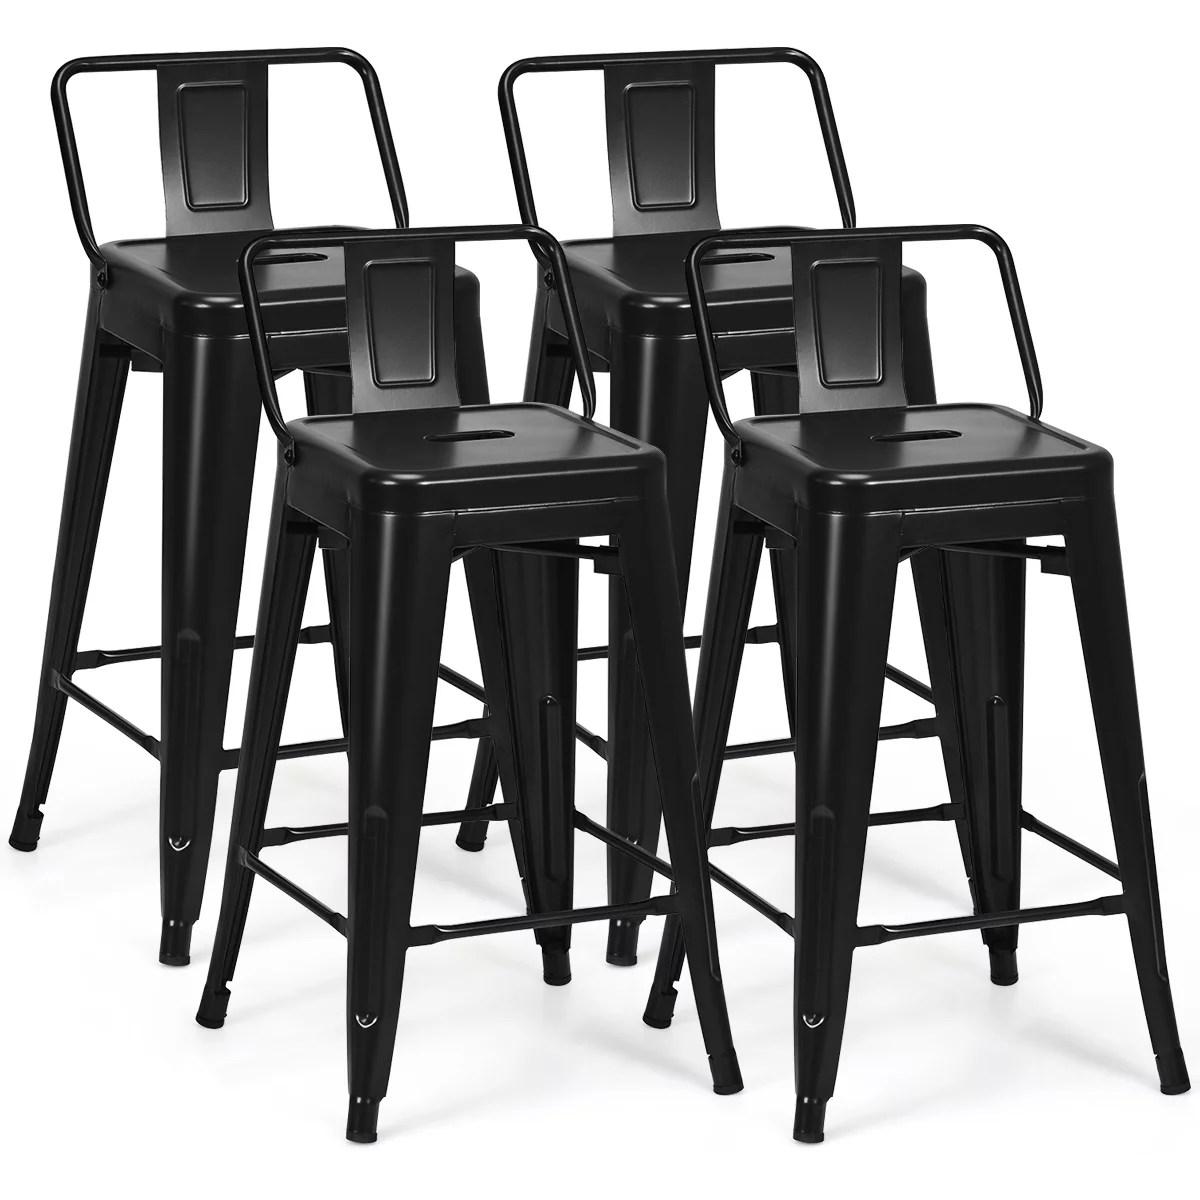 Costway Set Of 4 Low Back Metal Counter Stool 24 Seat Height Bar Stools Matte Black Walmart Canada